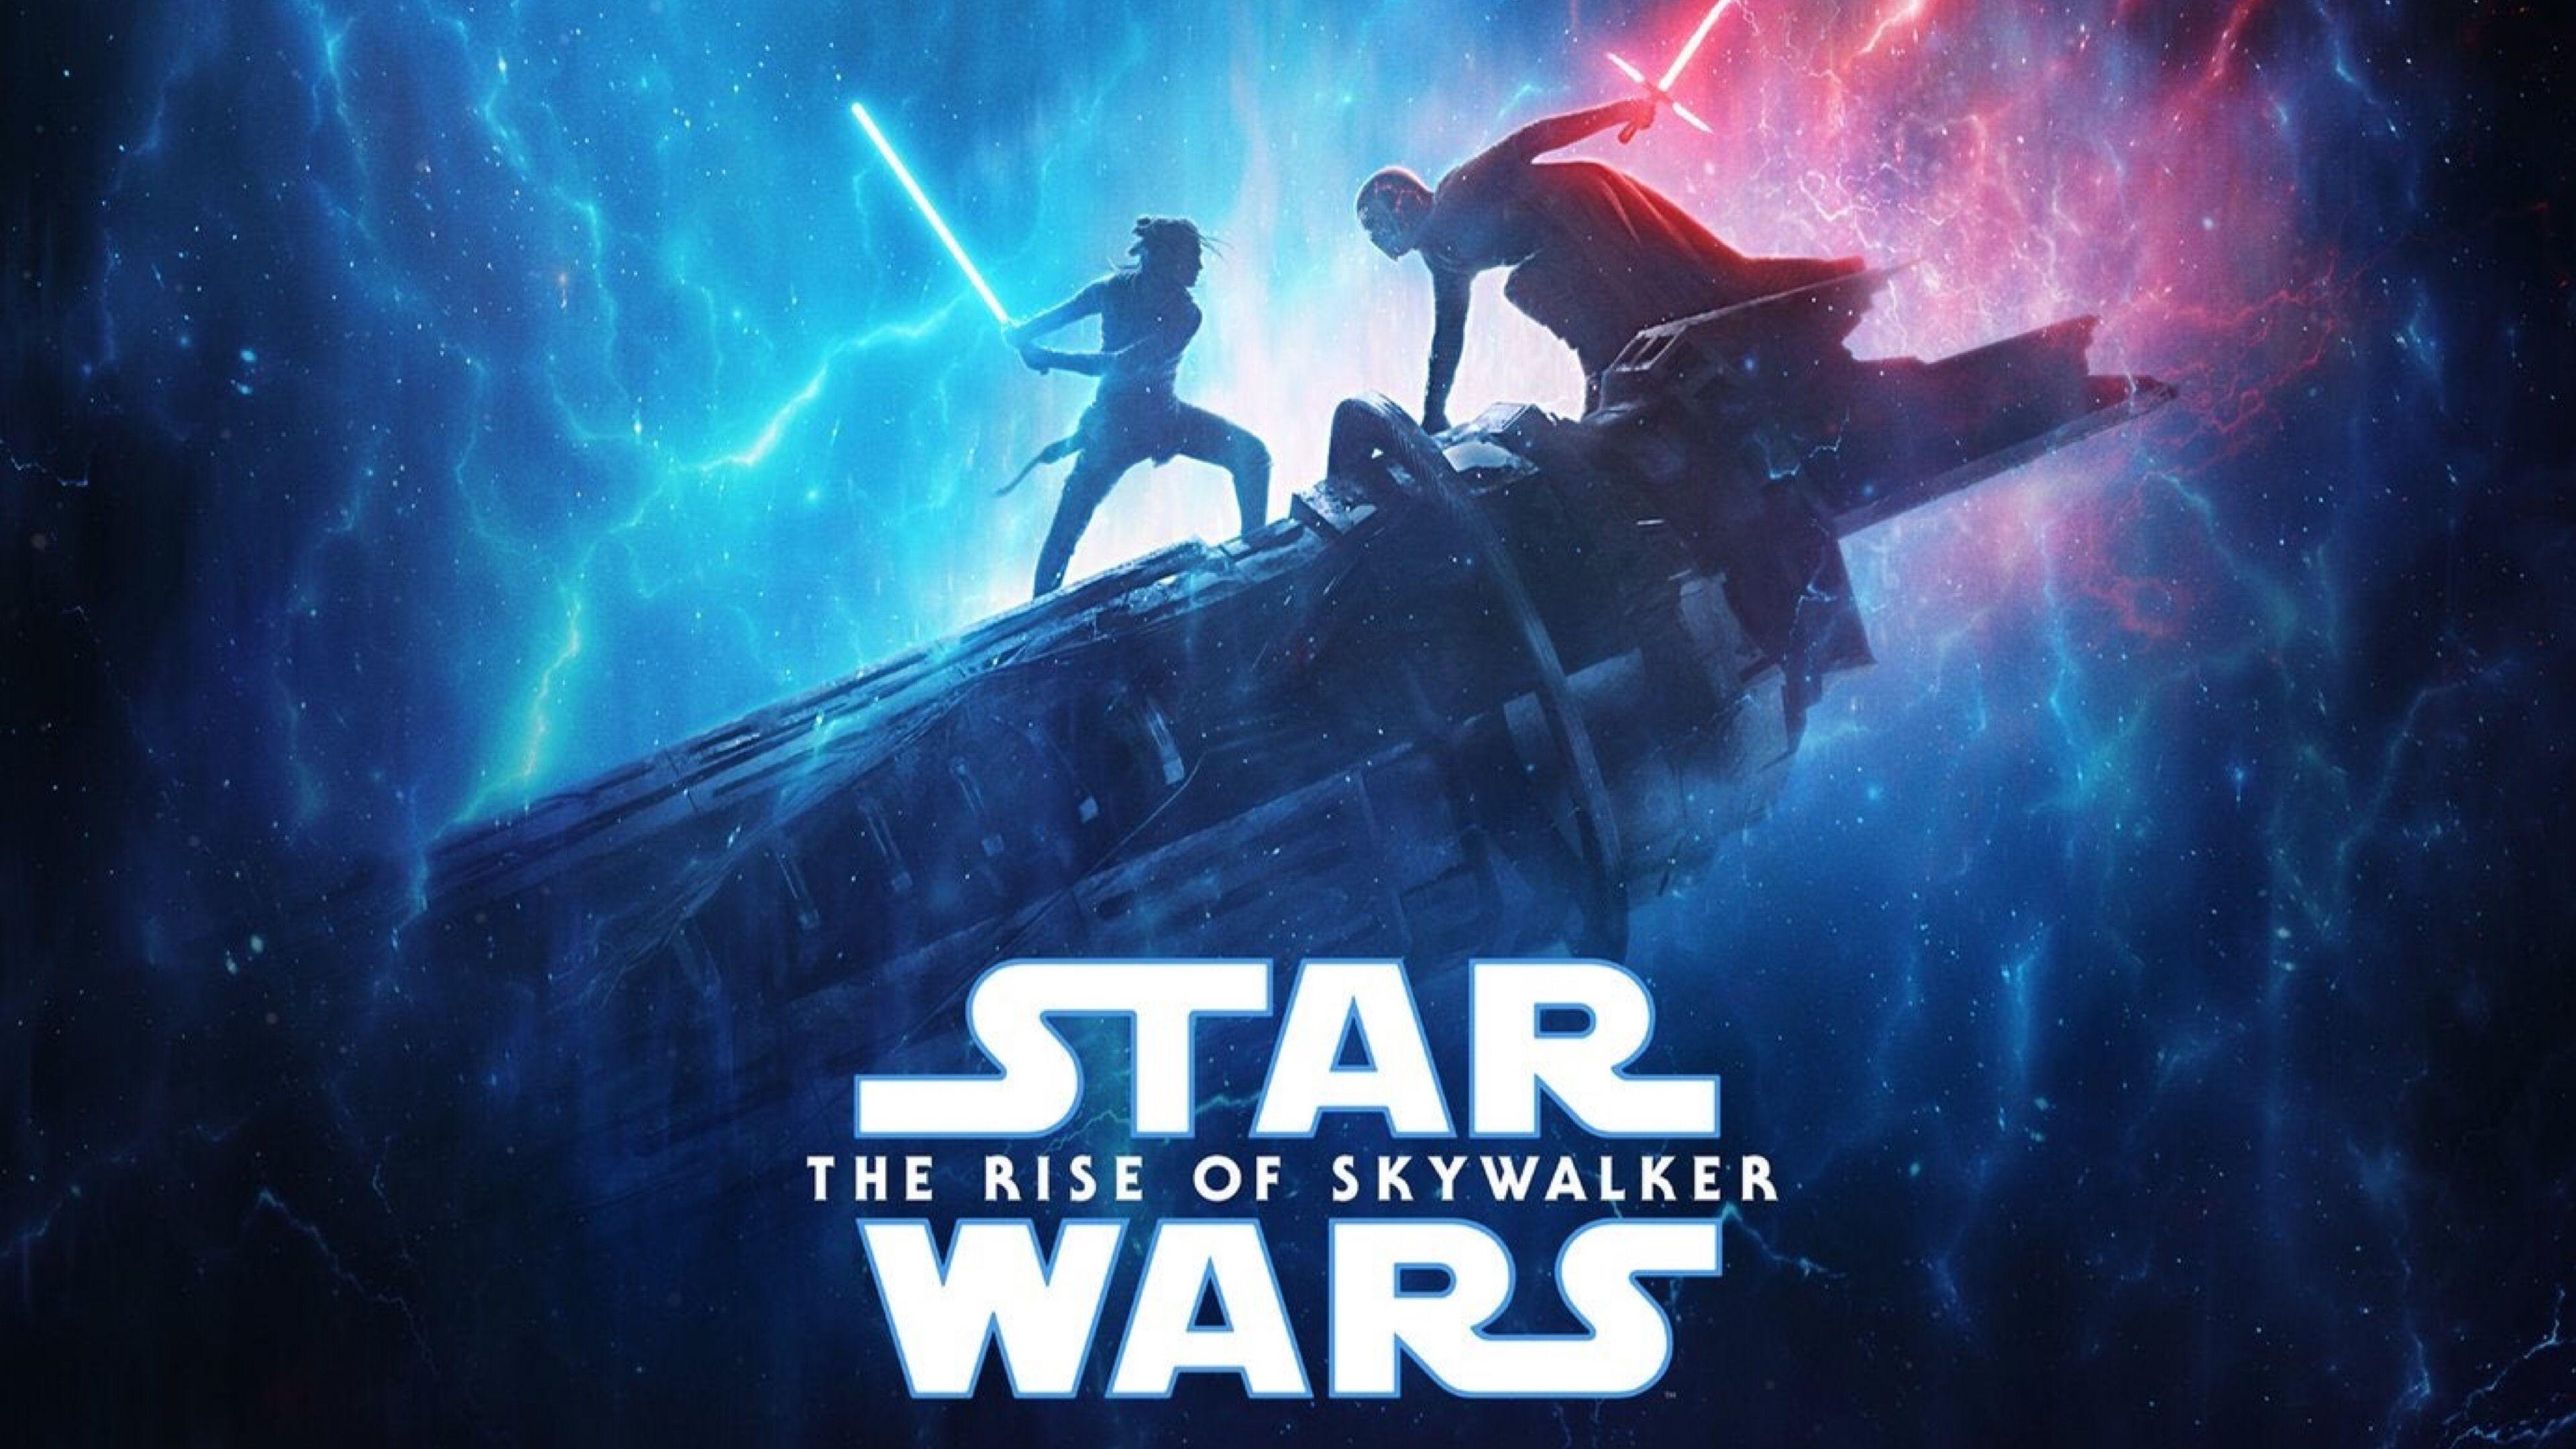 New Special Look Teaser Trailer For Star Wars Xi Rise Of The Skywalker Star Wars Film Star Wars Images Star Wars